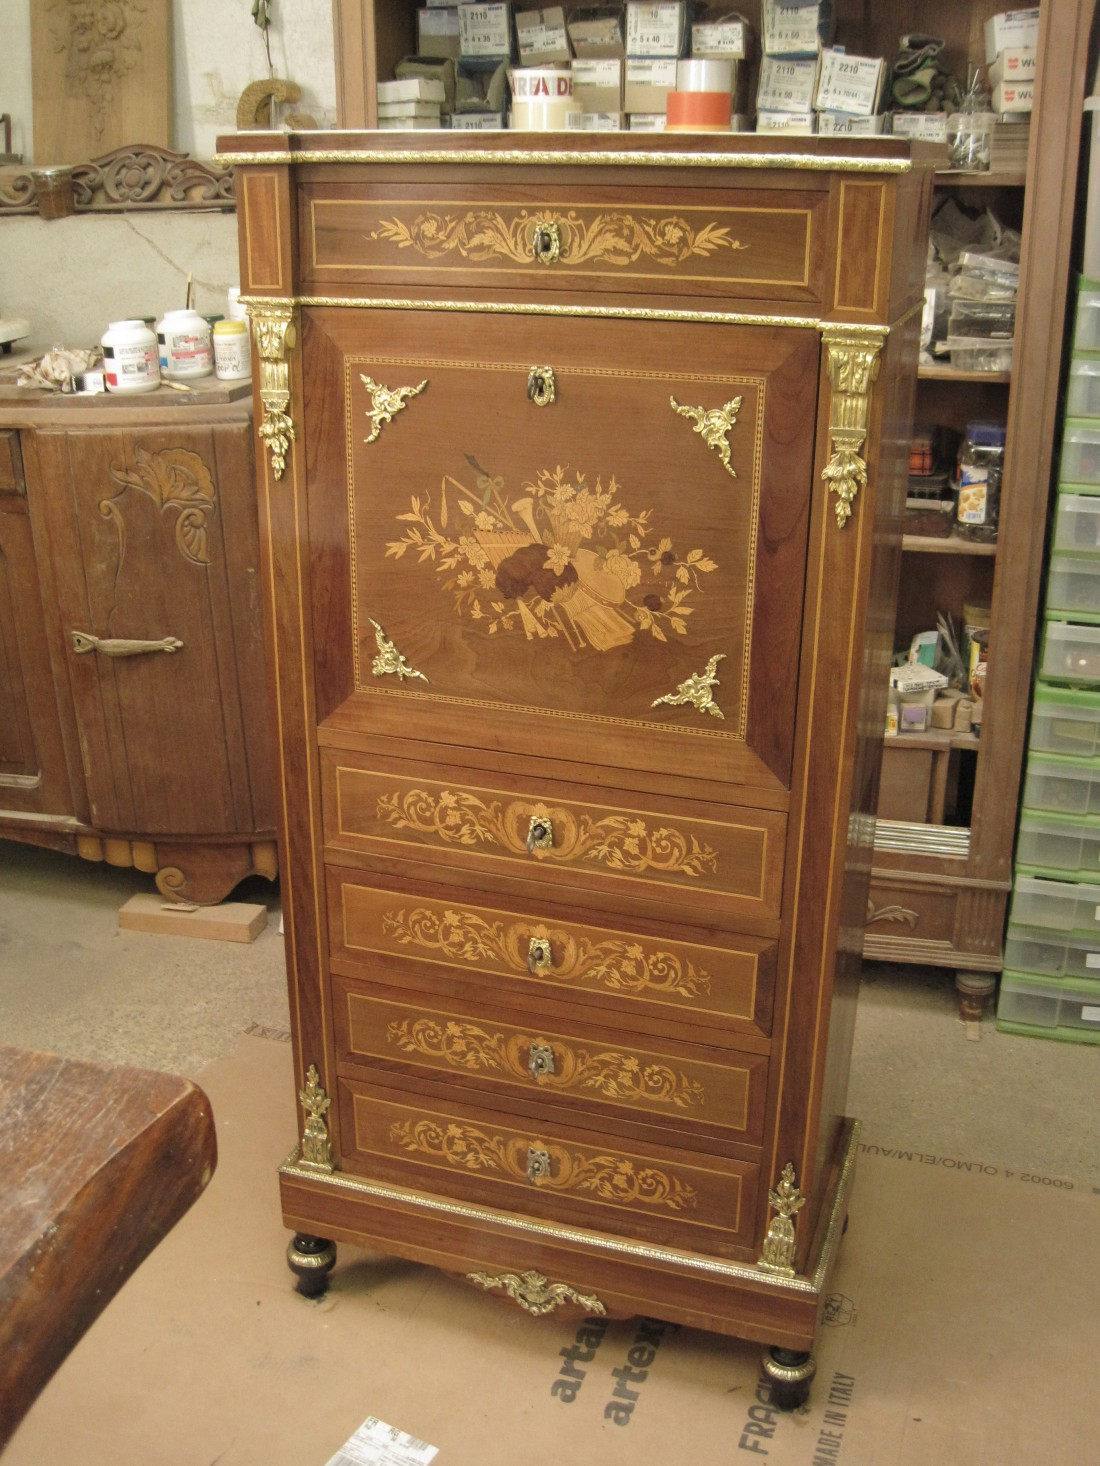 secr taire napol on iii lignes d 39 art restauration de meubles. Black Bedroom Furniture Sets. Home Design Ideas